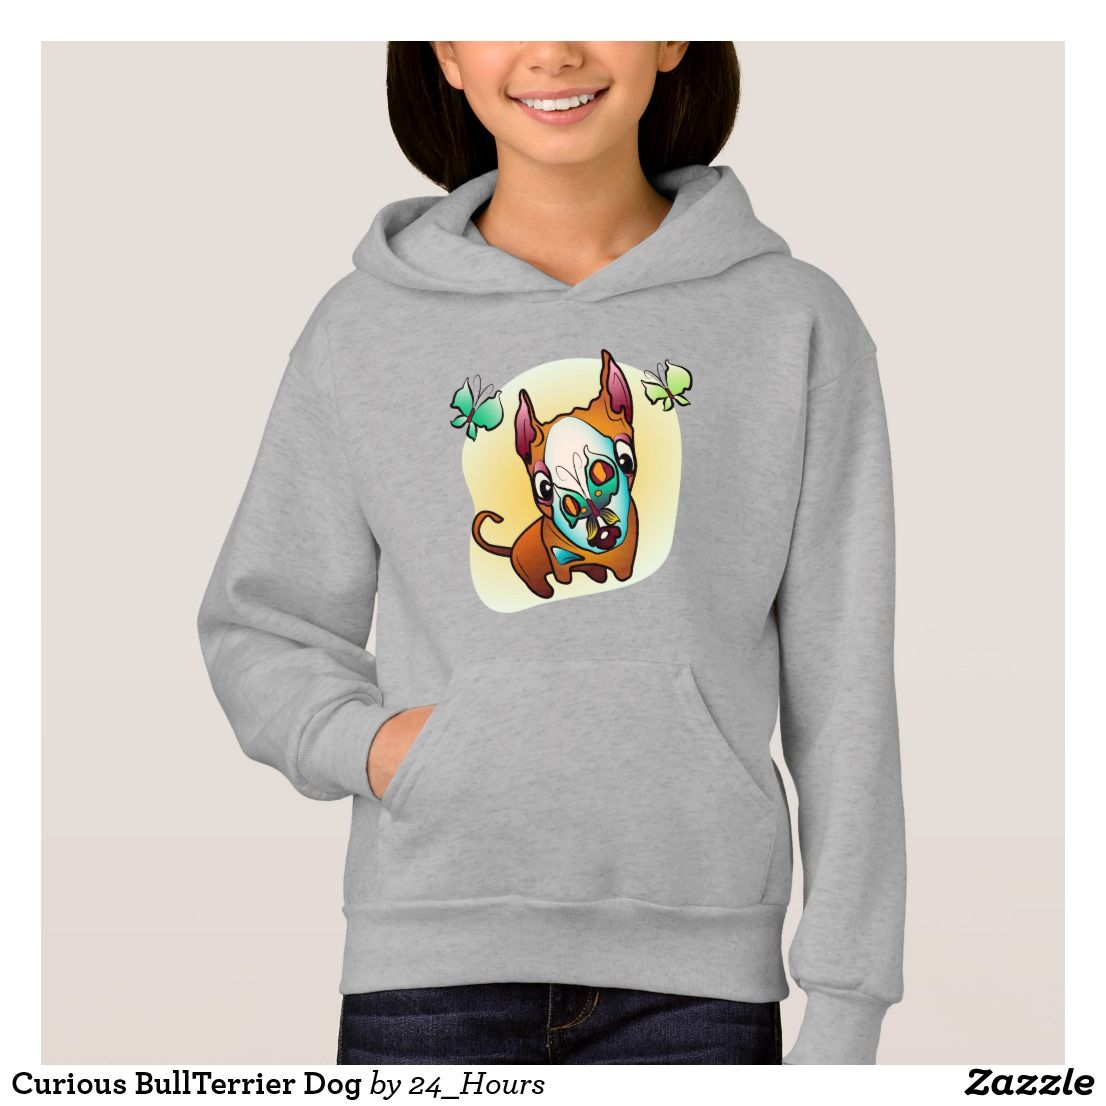 Curious BullTerrier Dog Hoodie | Zazzle.com | Hoodies ...